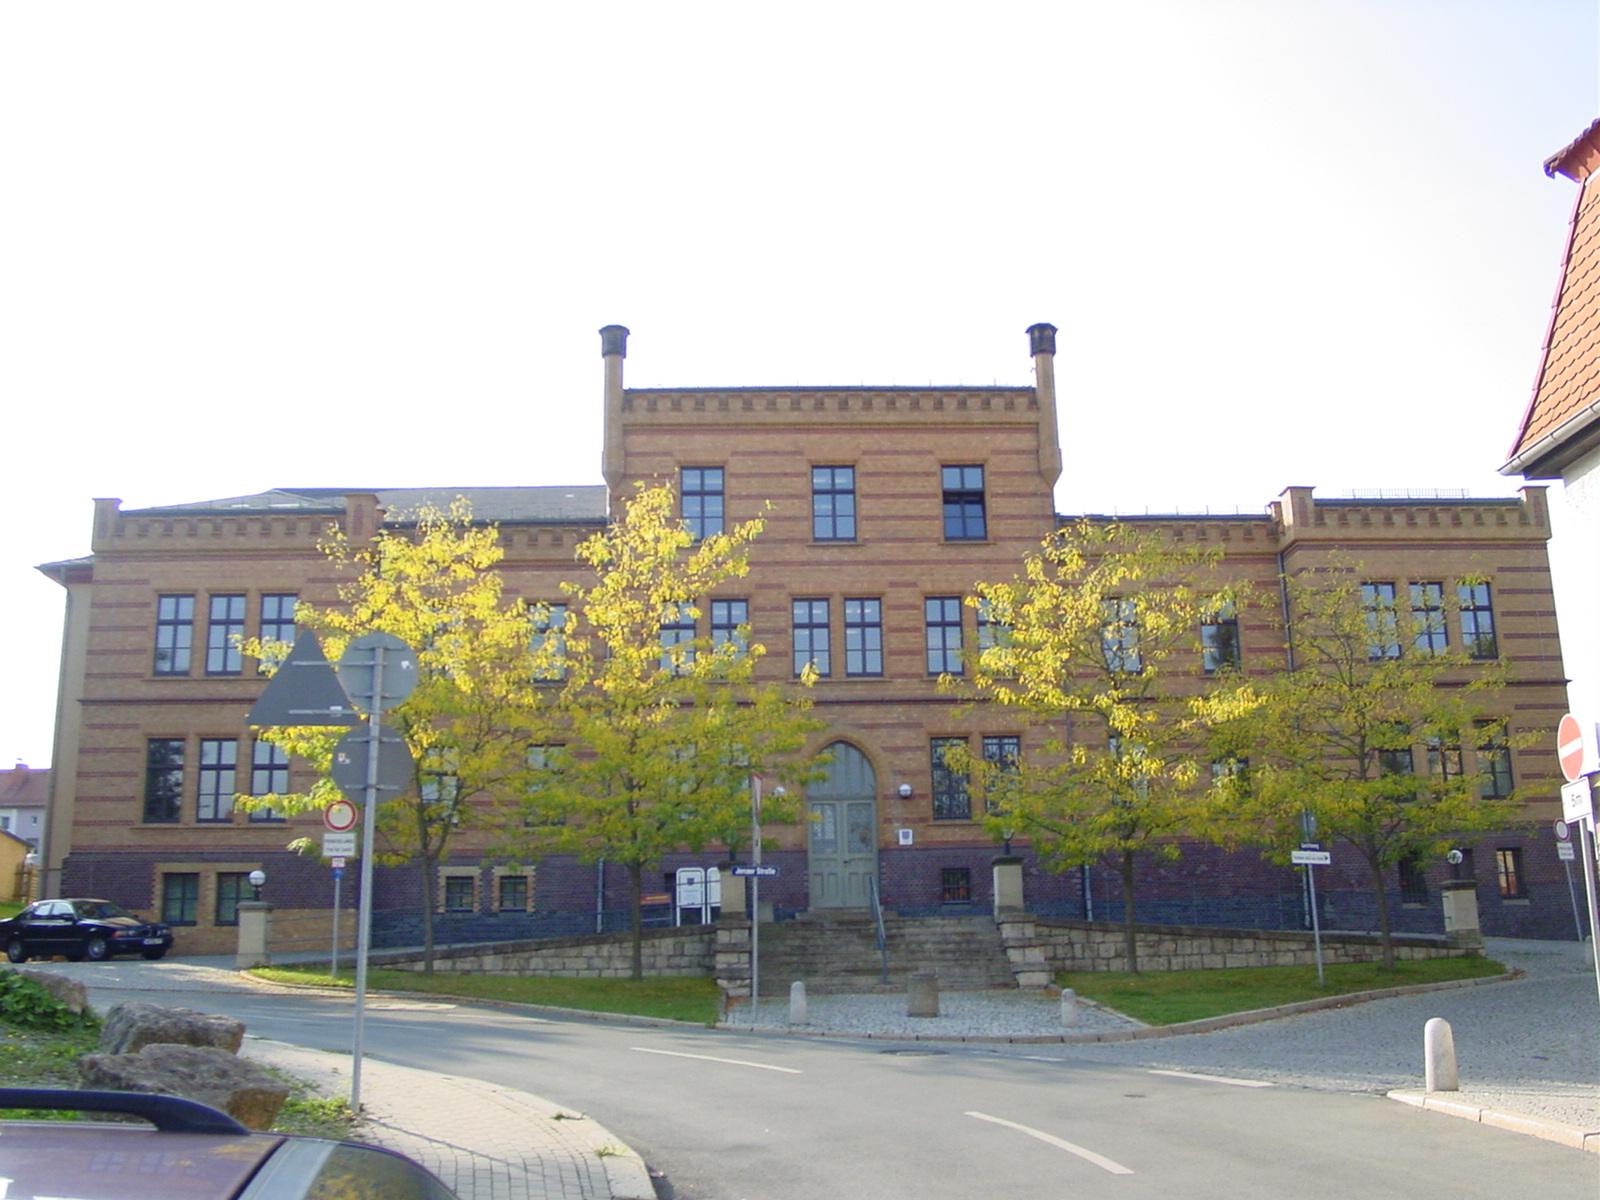 Bild: Gerichtsgebäude des Amtsgerichts Apolda